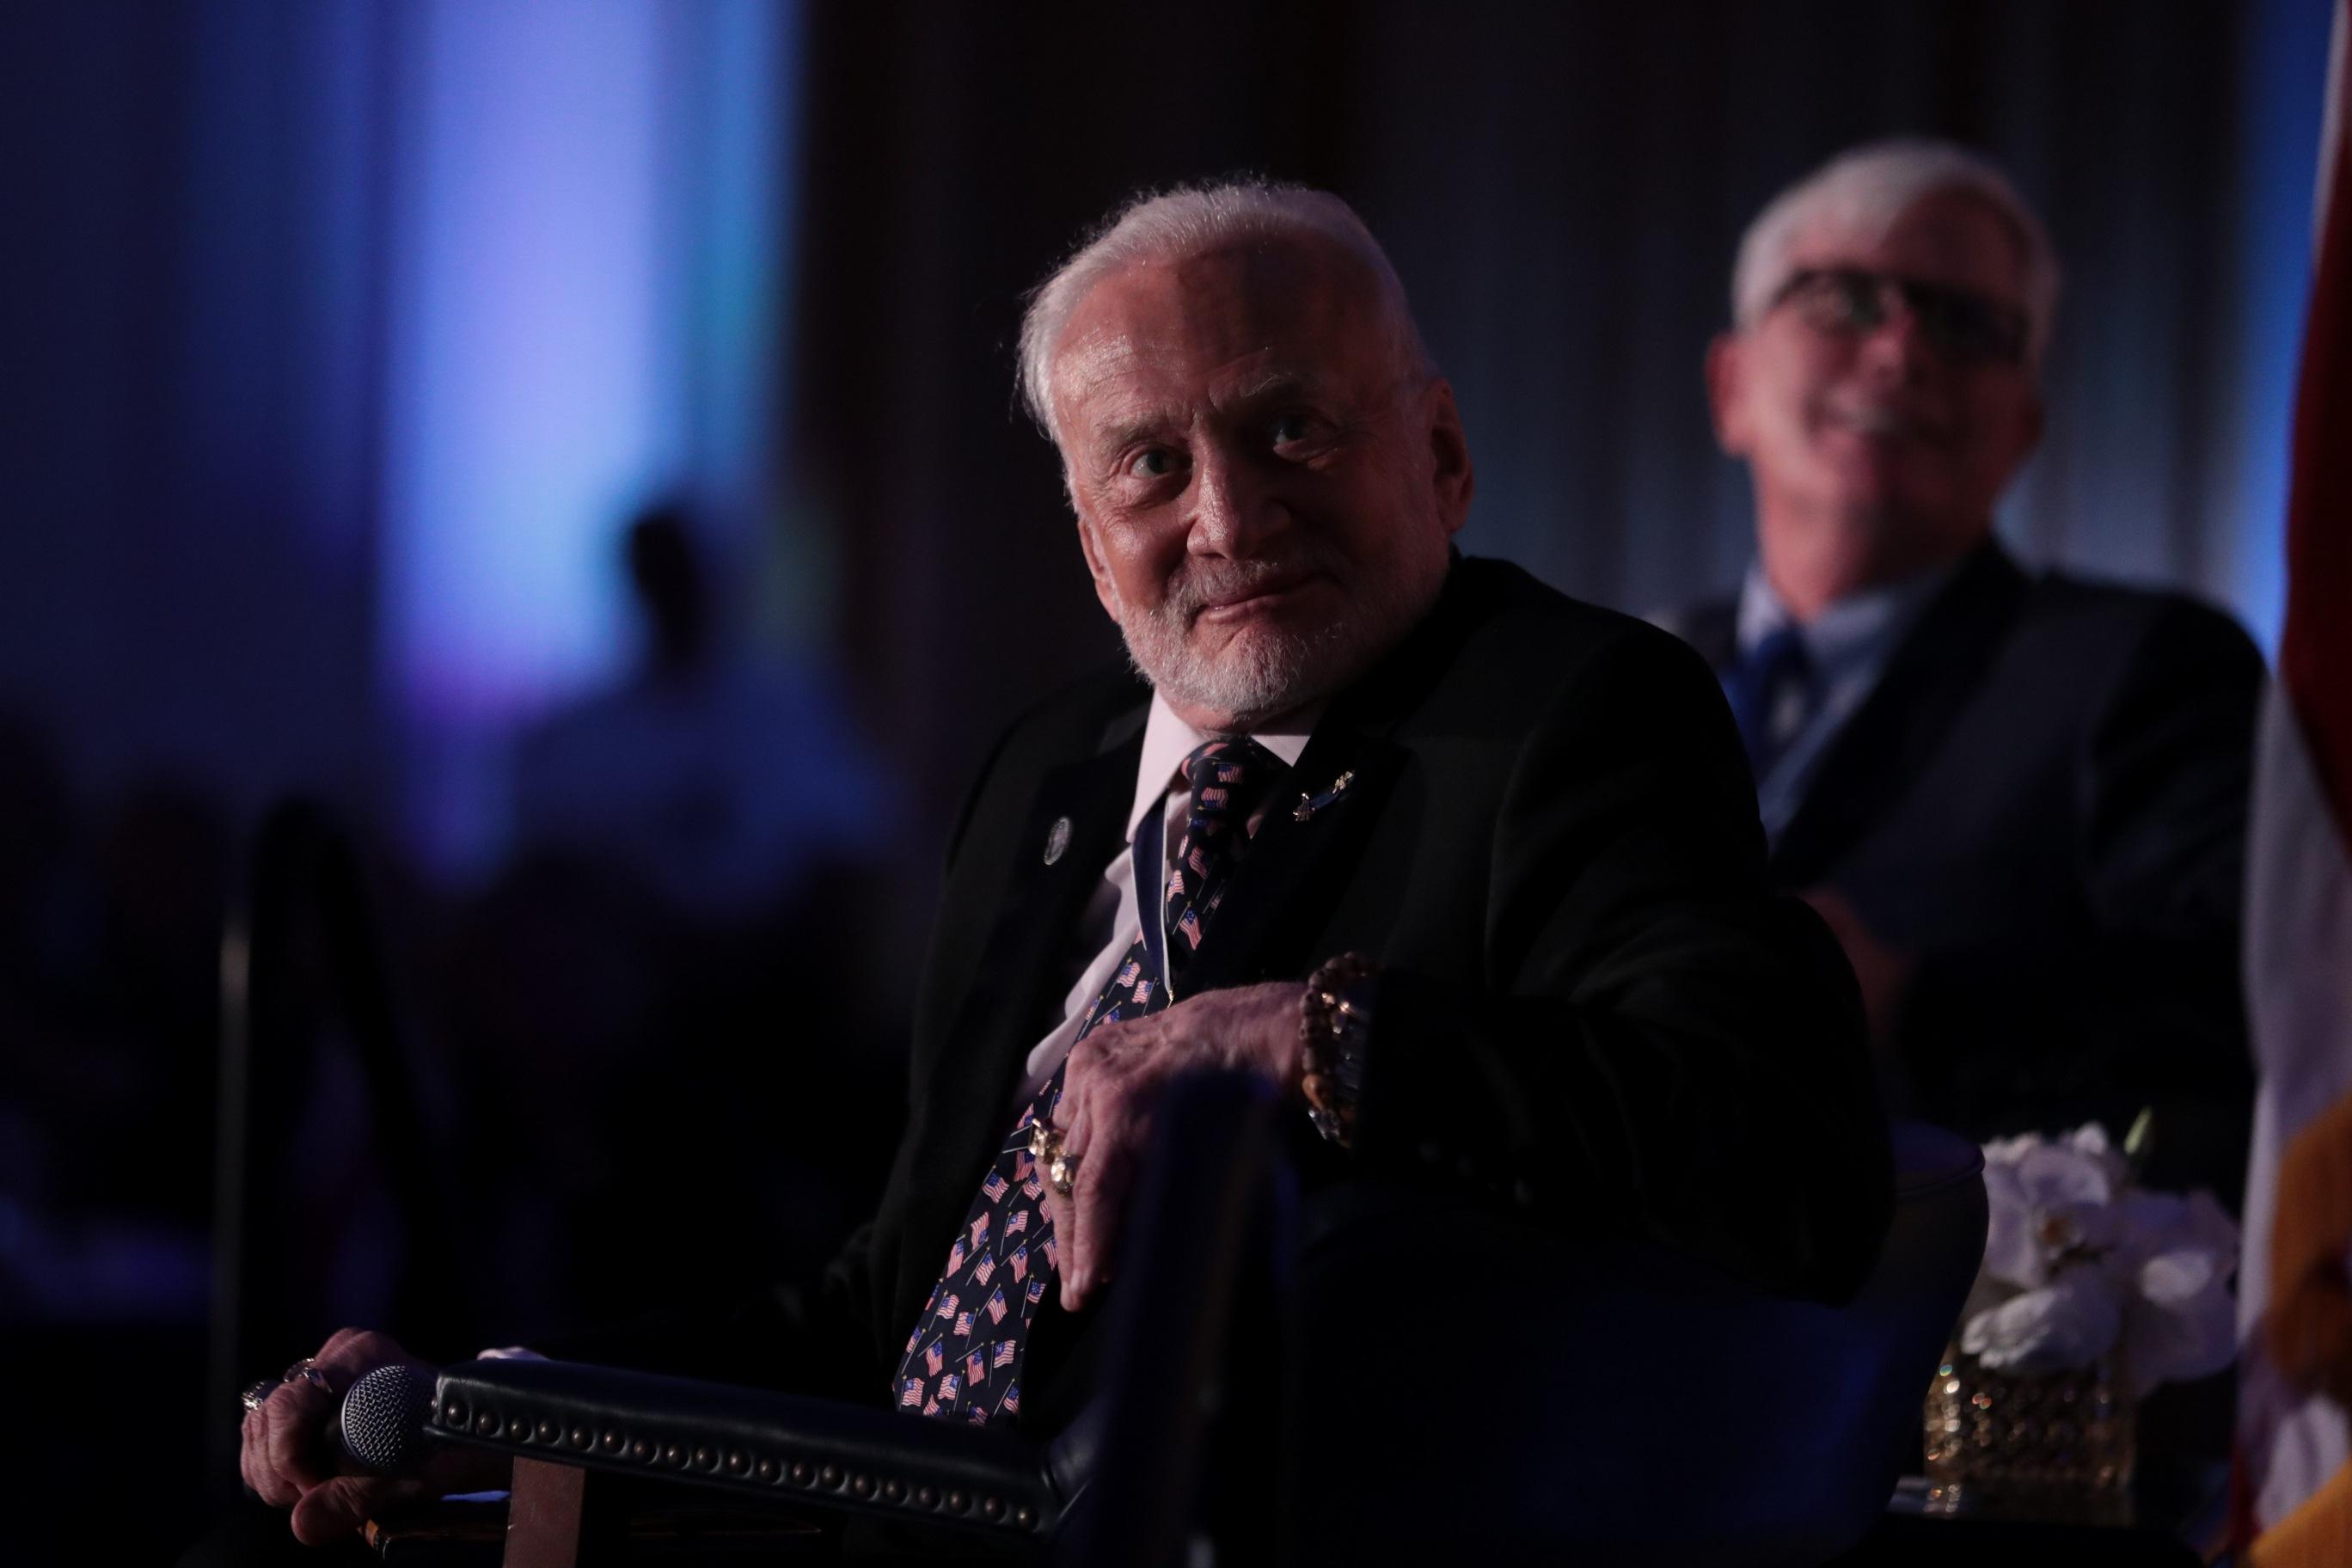 Podcast: Buzz Aldrin on Apollo 11 at 50